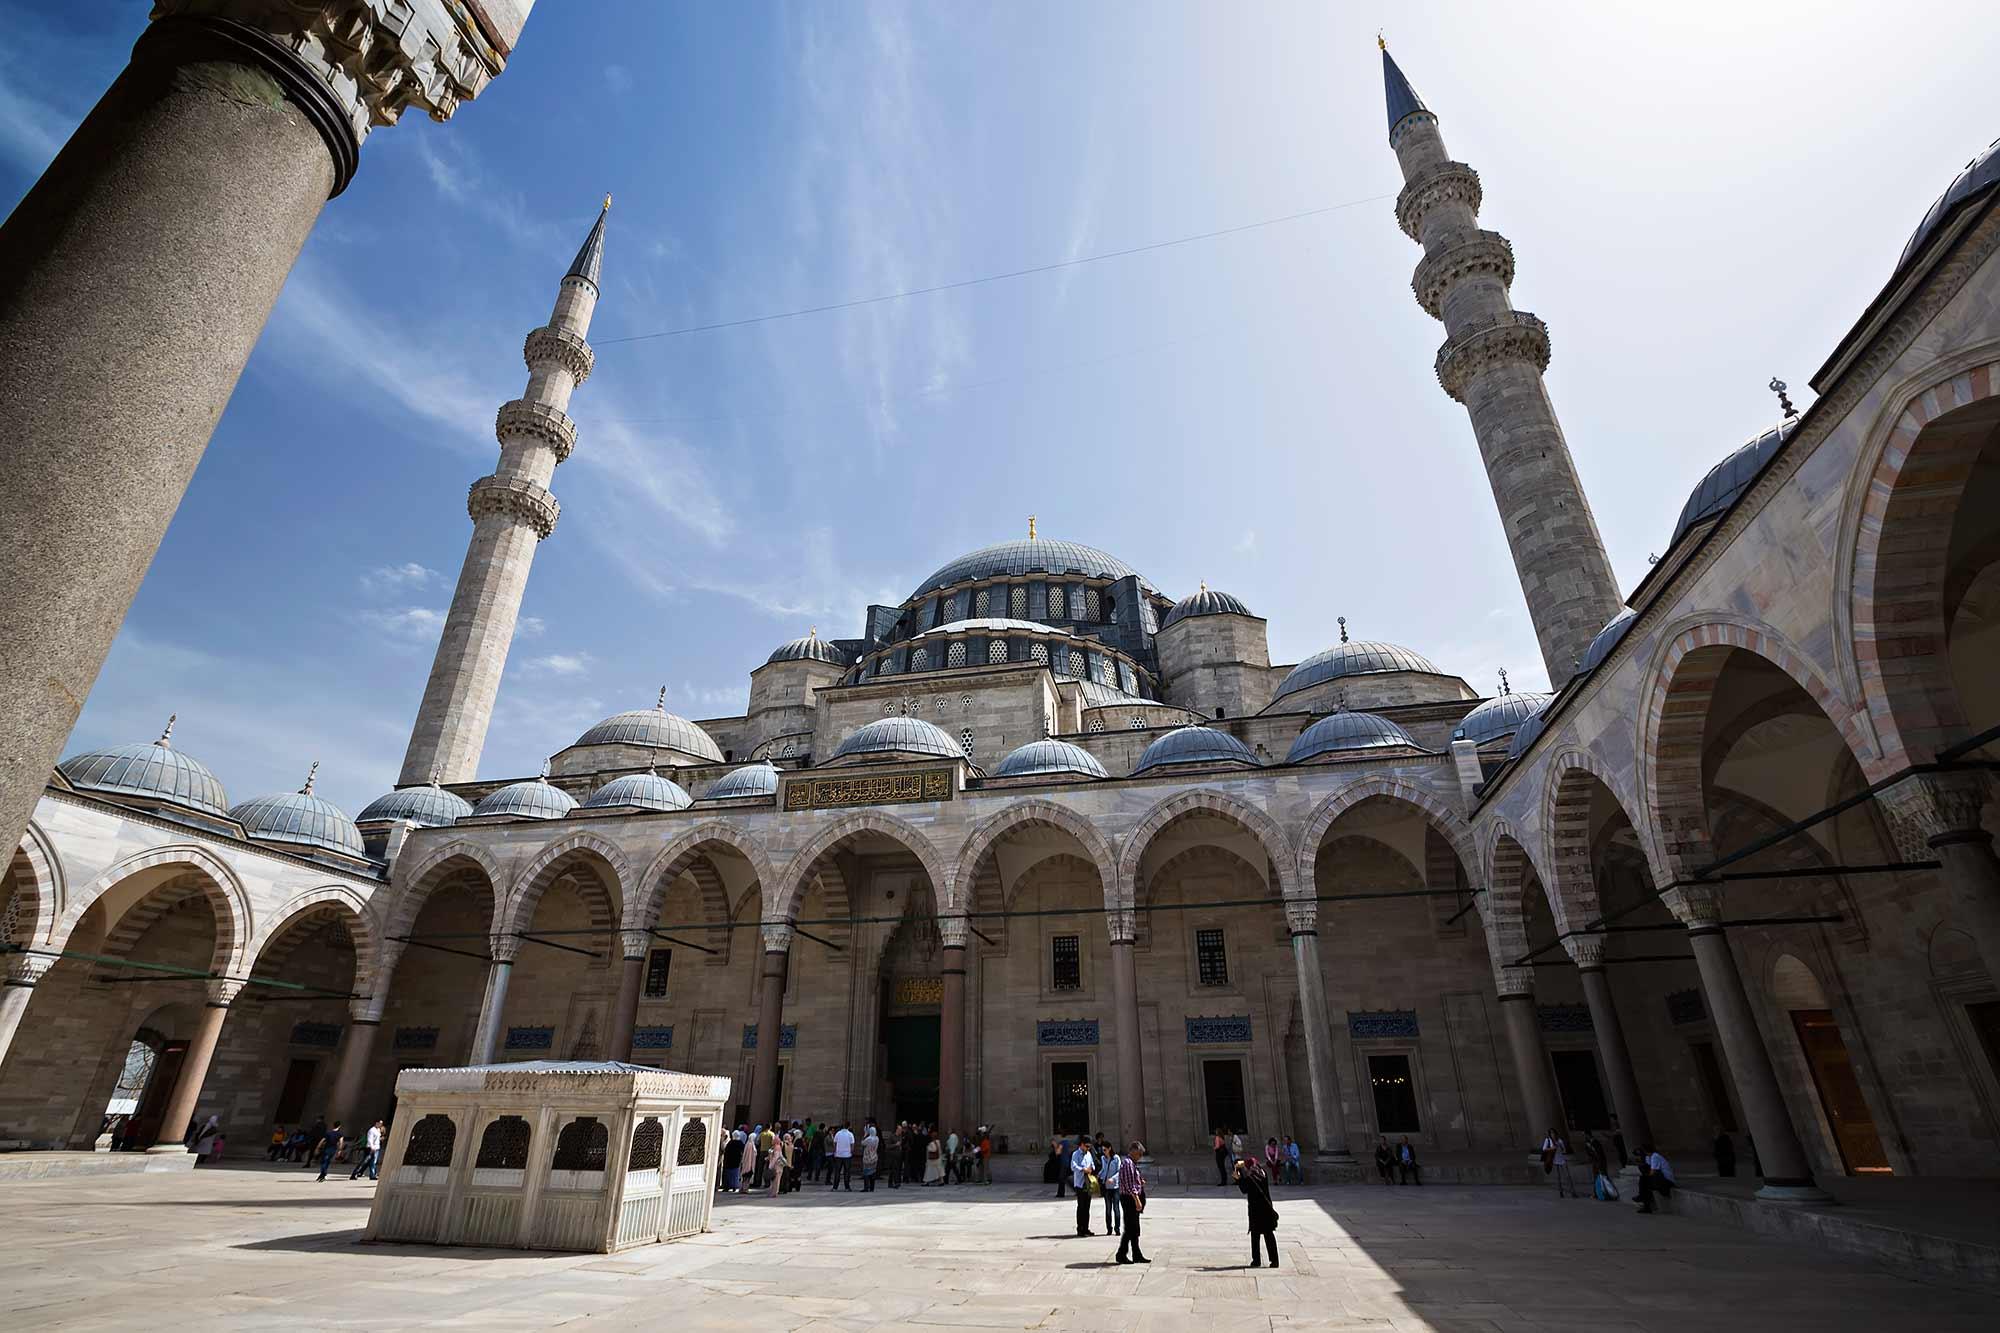 Süleymaniye Mosque in Istanbul, Turkey. © Ulli Maier & Nisa Maier